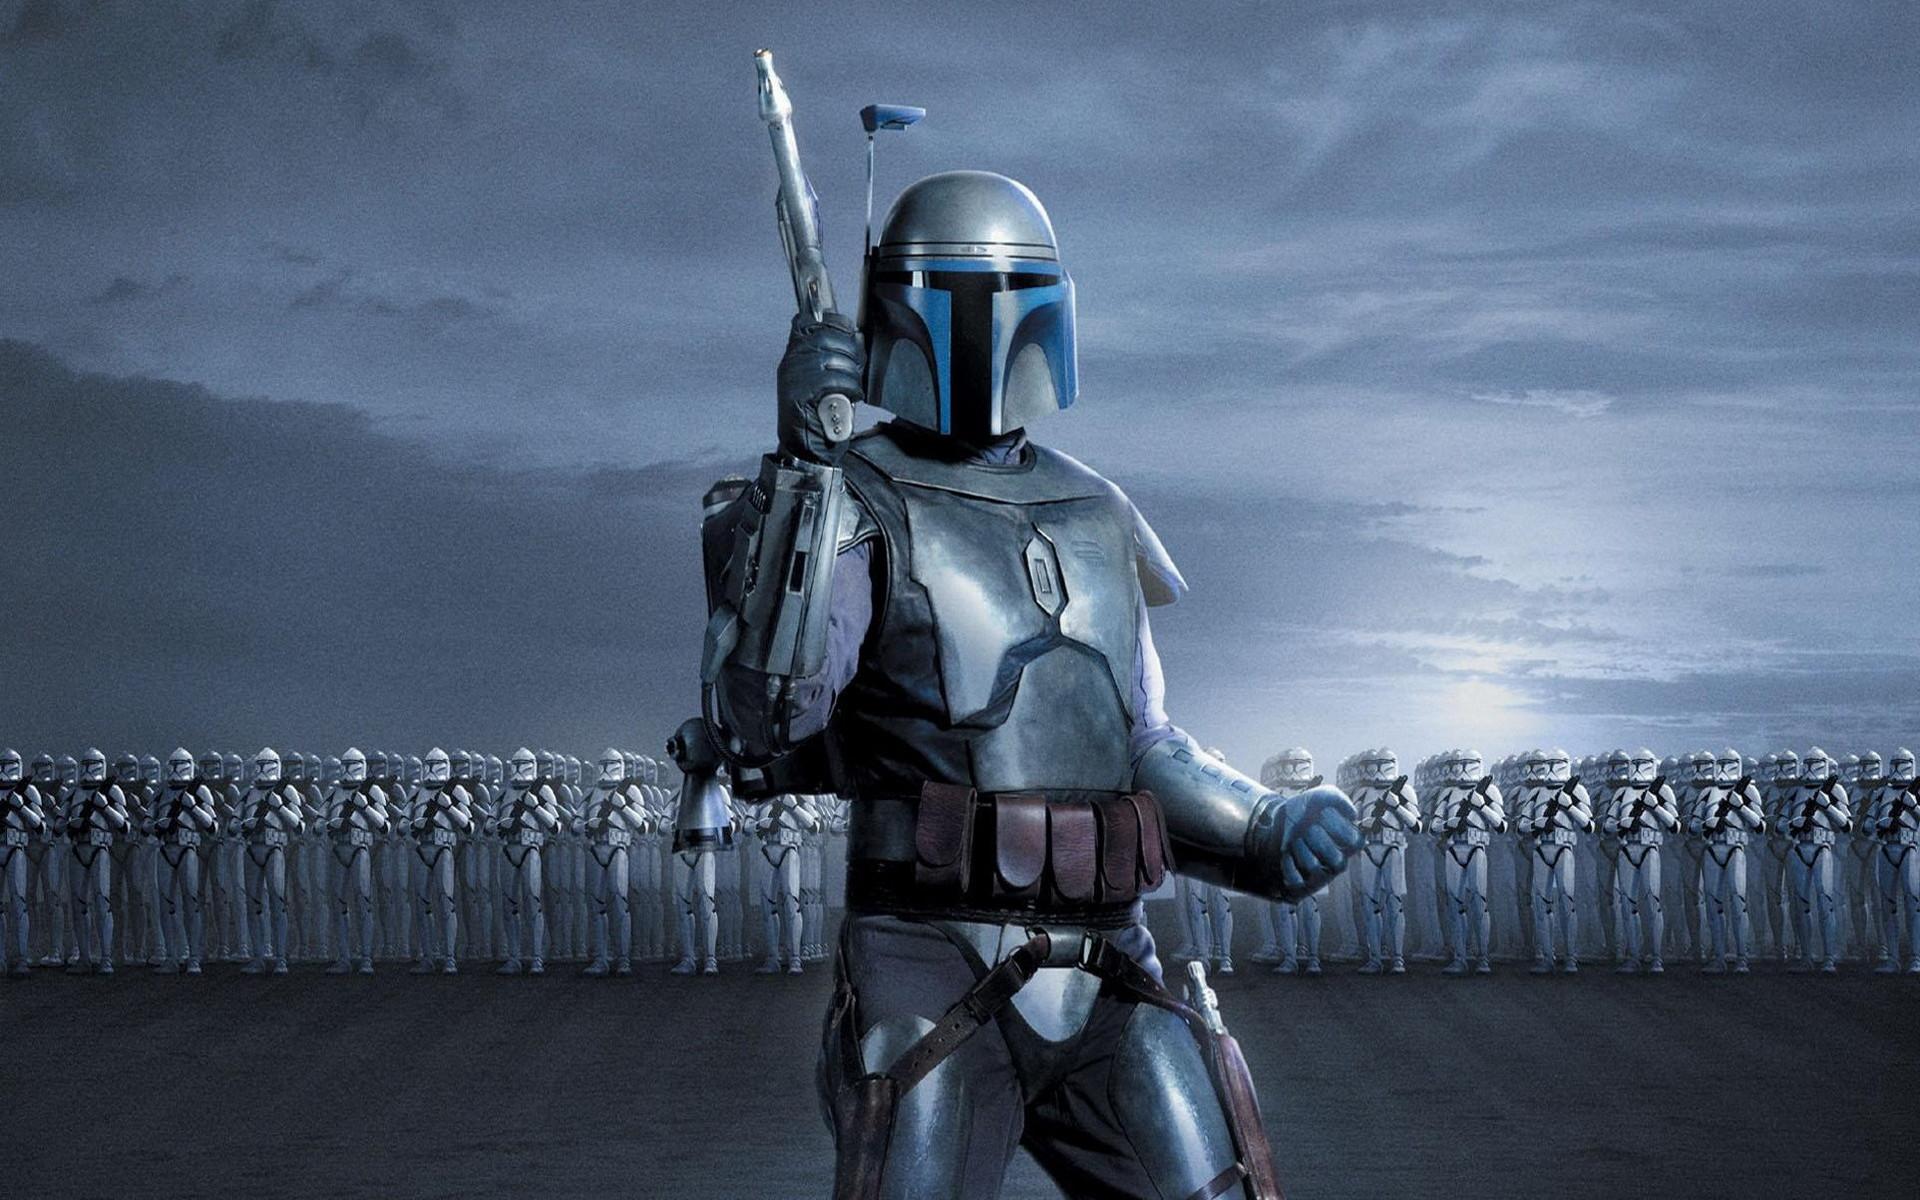 Movie – Star Wars Episode II: Attack Of The Clones Jango Fett Clone Trooper  Wallpaper